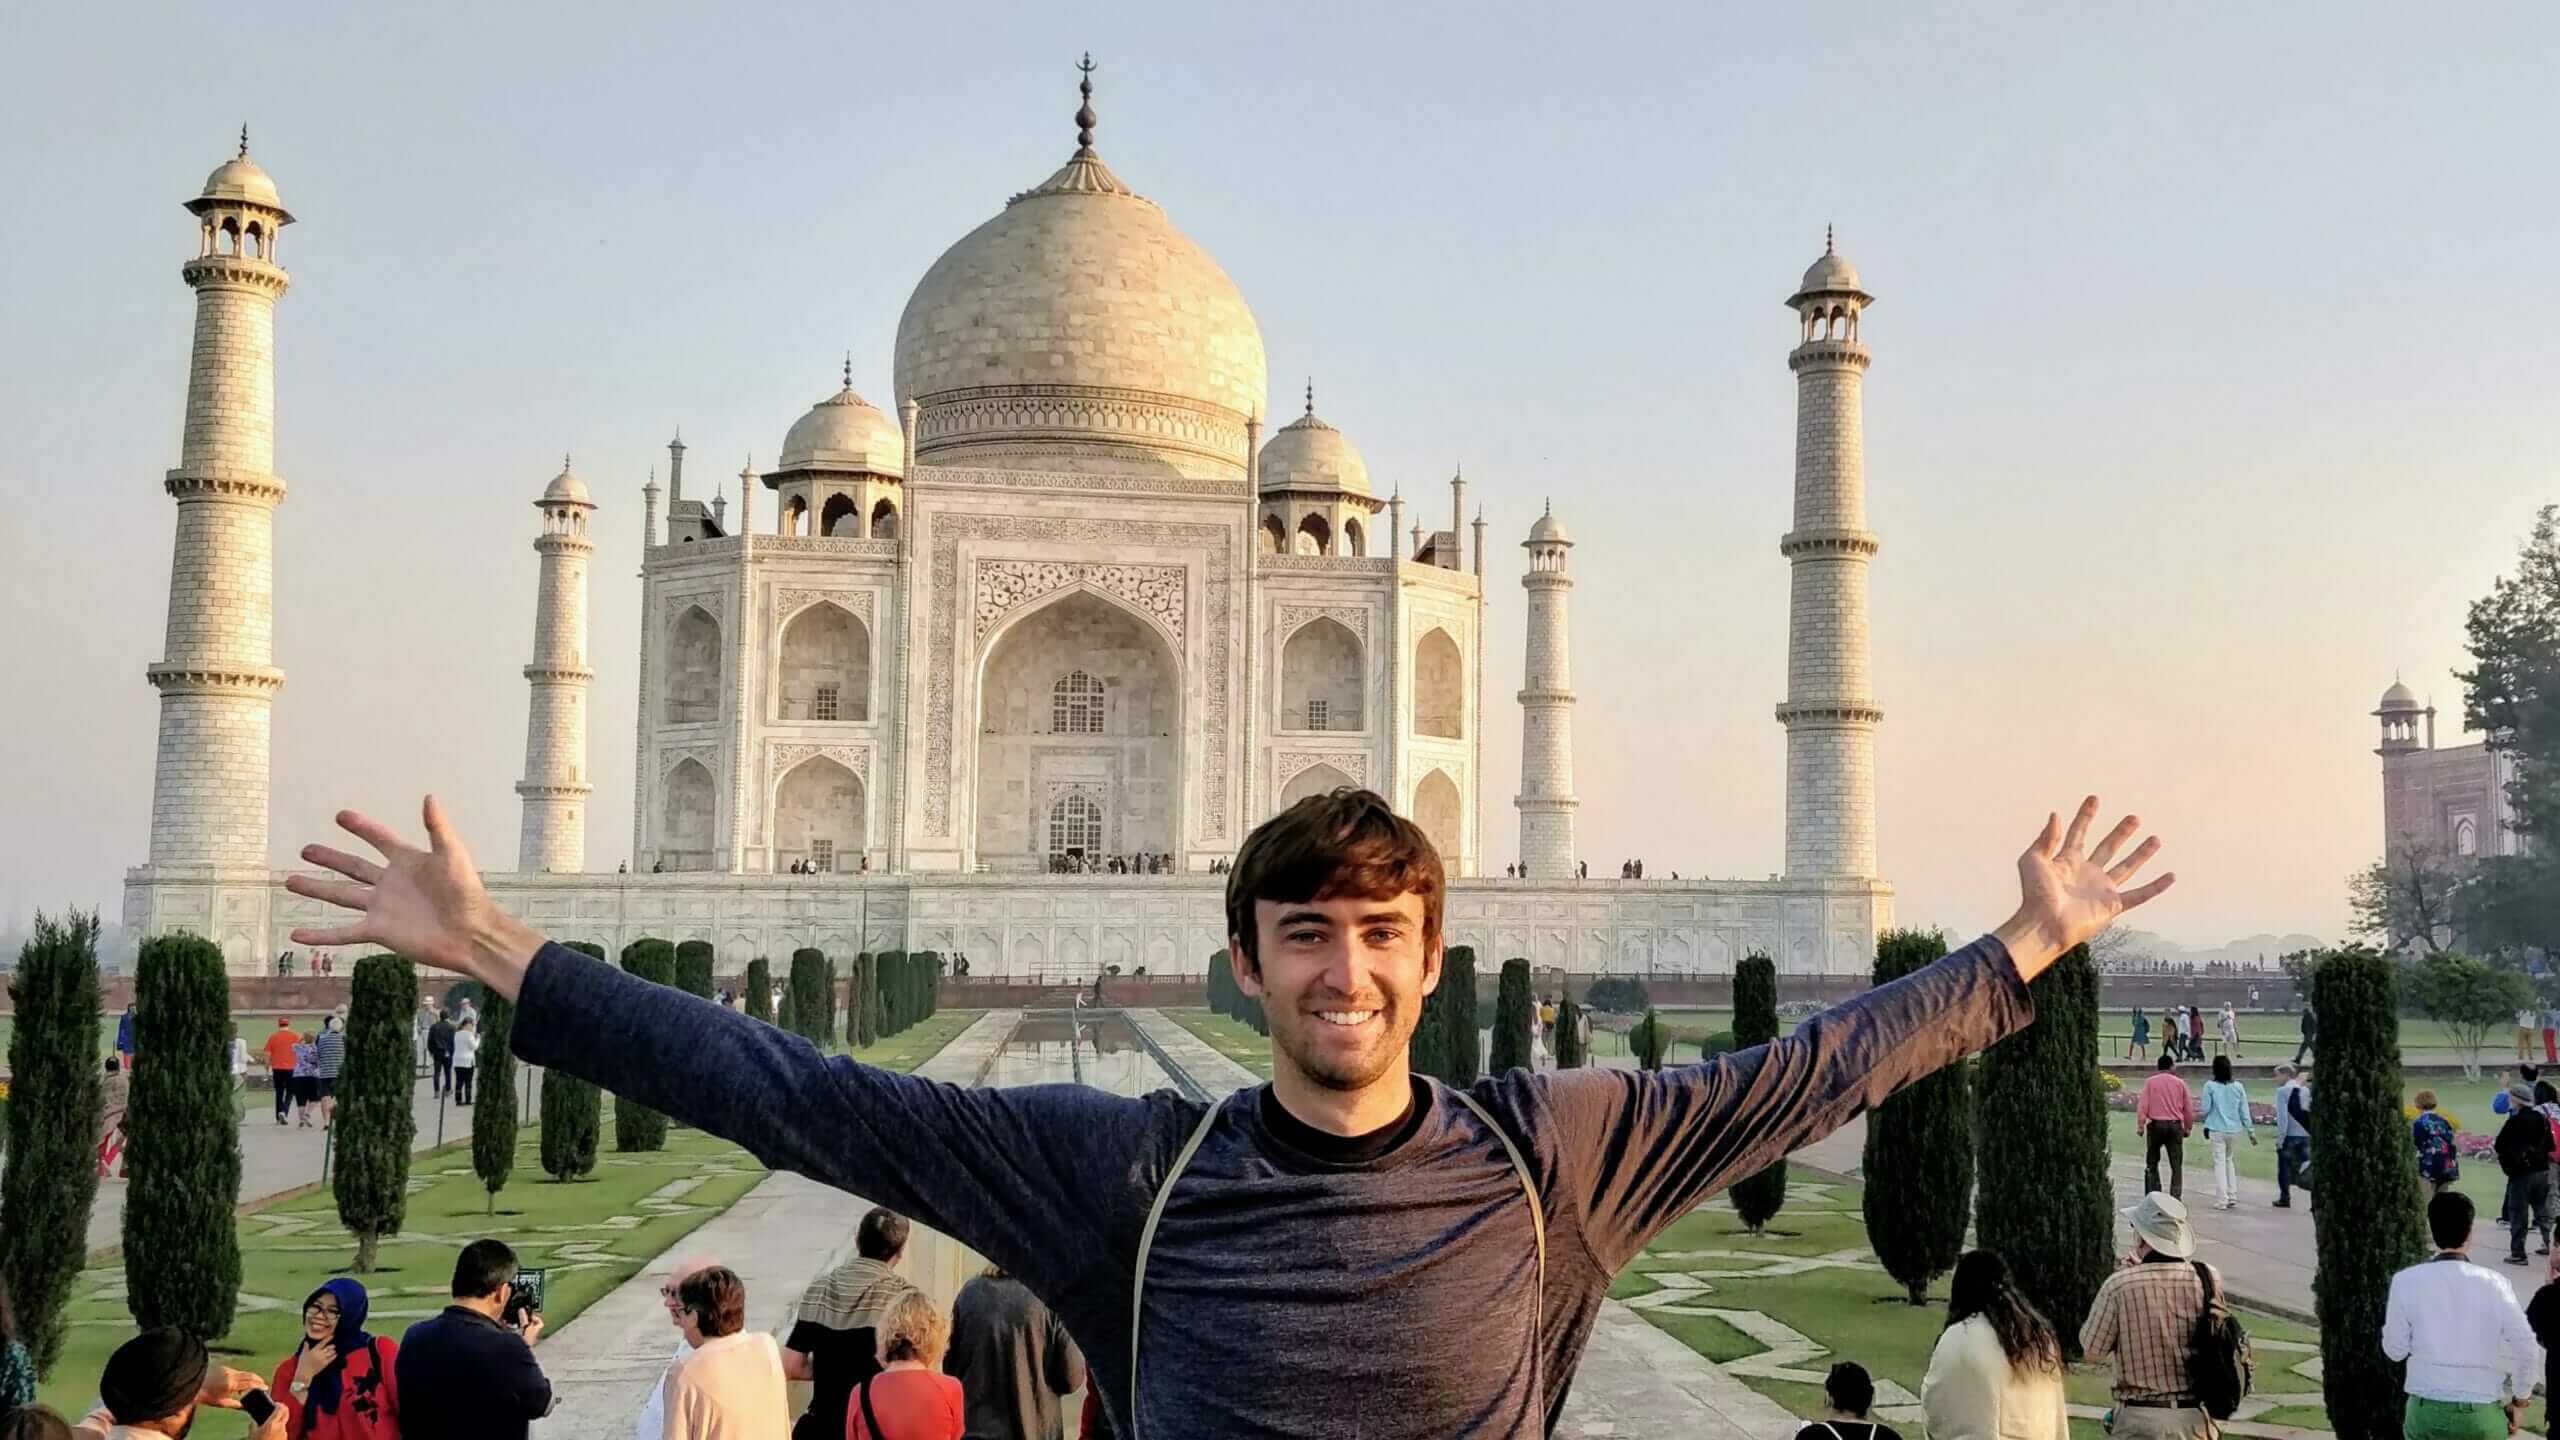 Tony Florida backpacking India at the Taj Mahal in Agra, India